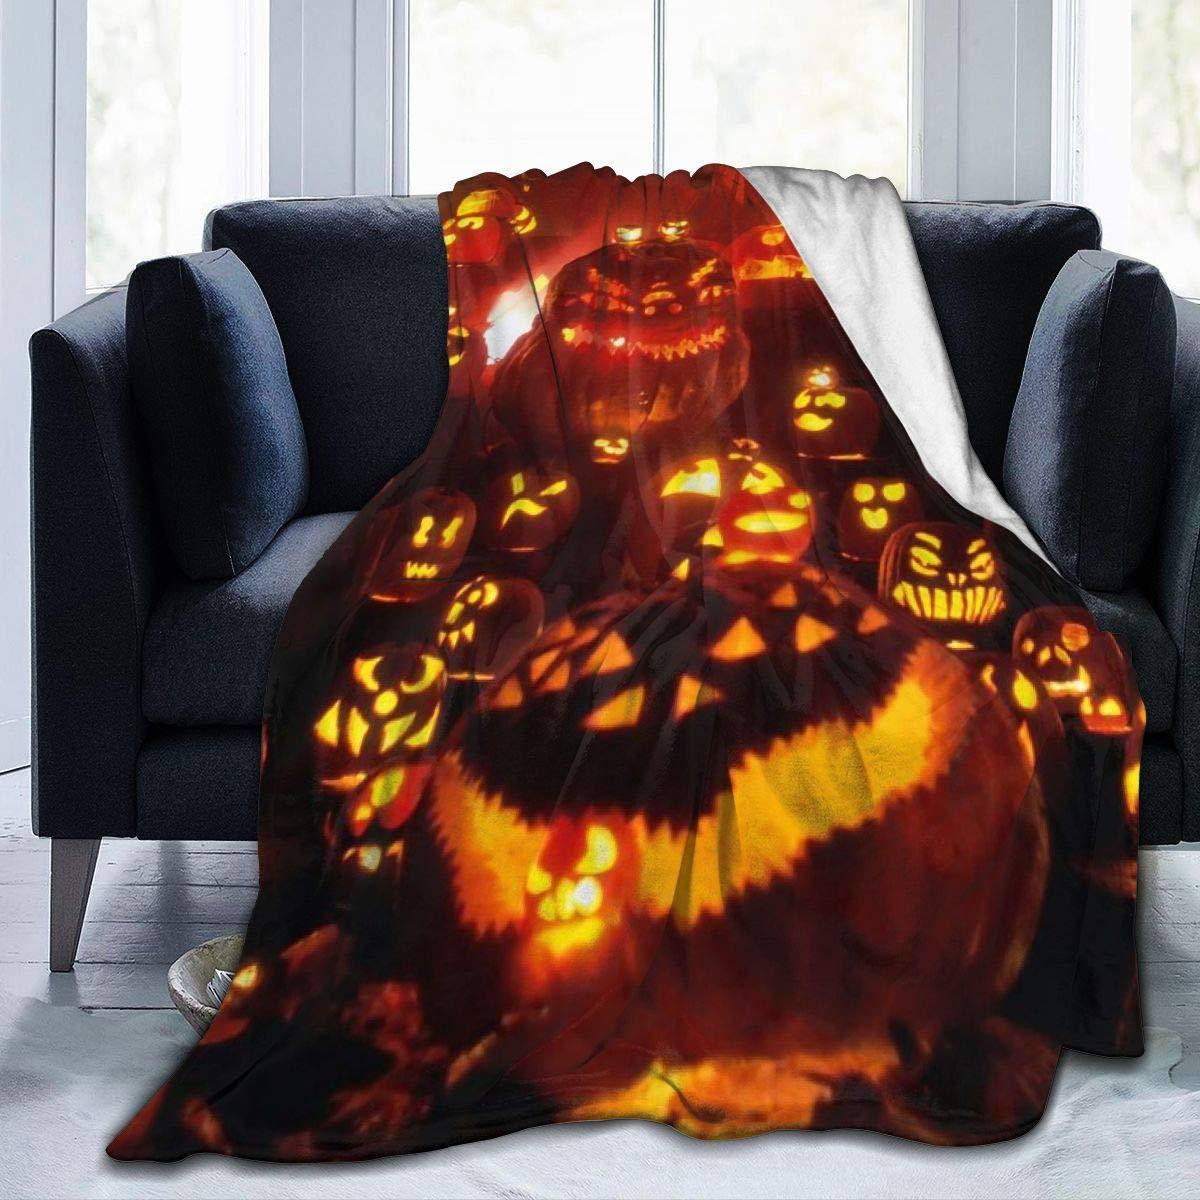 Halloween Pumpkin Blanket Flannel 3D Printed Soft Warm Throw Blanket Warm Home Bed Sofa Blanket 150X220cm